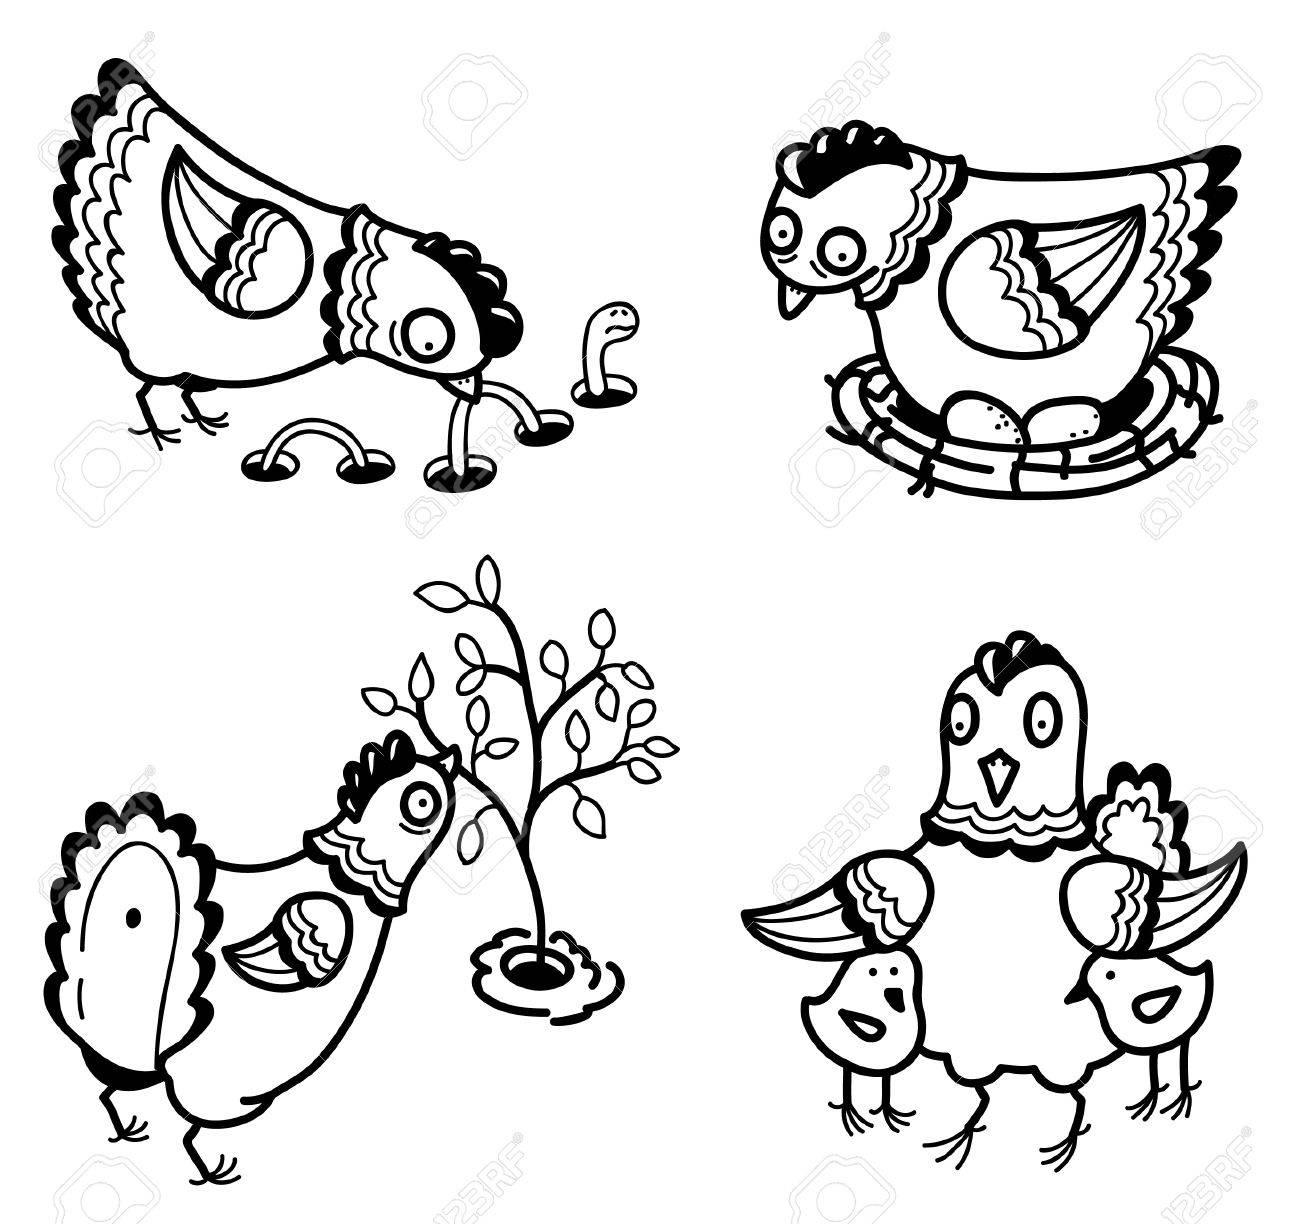 Cute chicken set (outline version) Stock Vector - 12248898